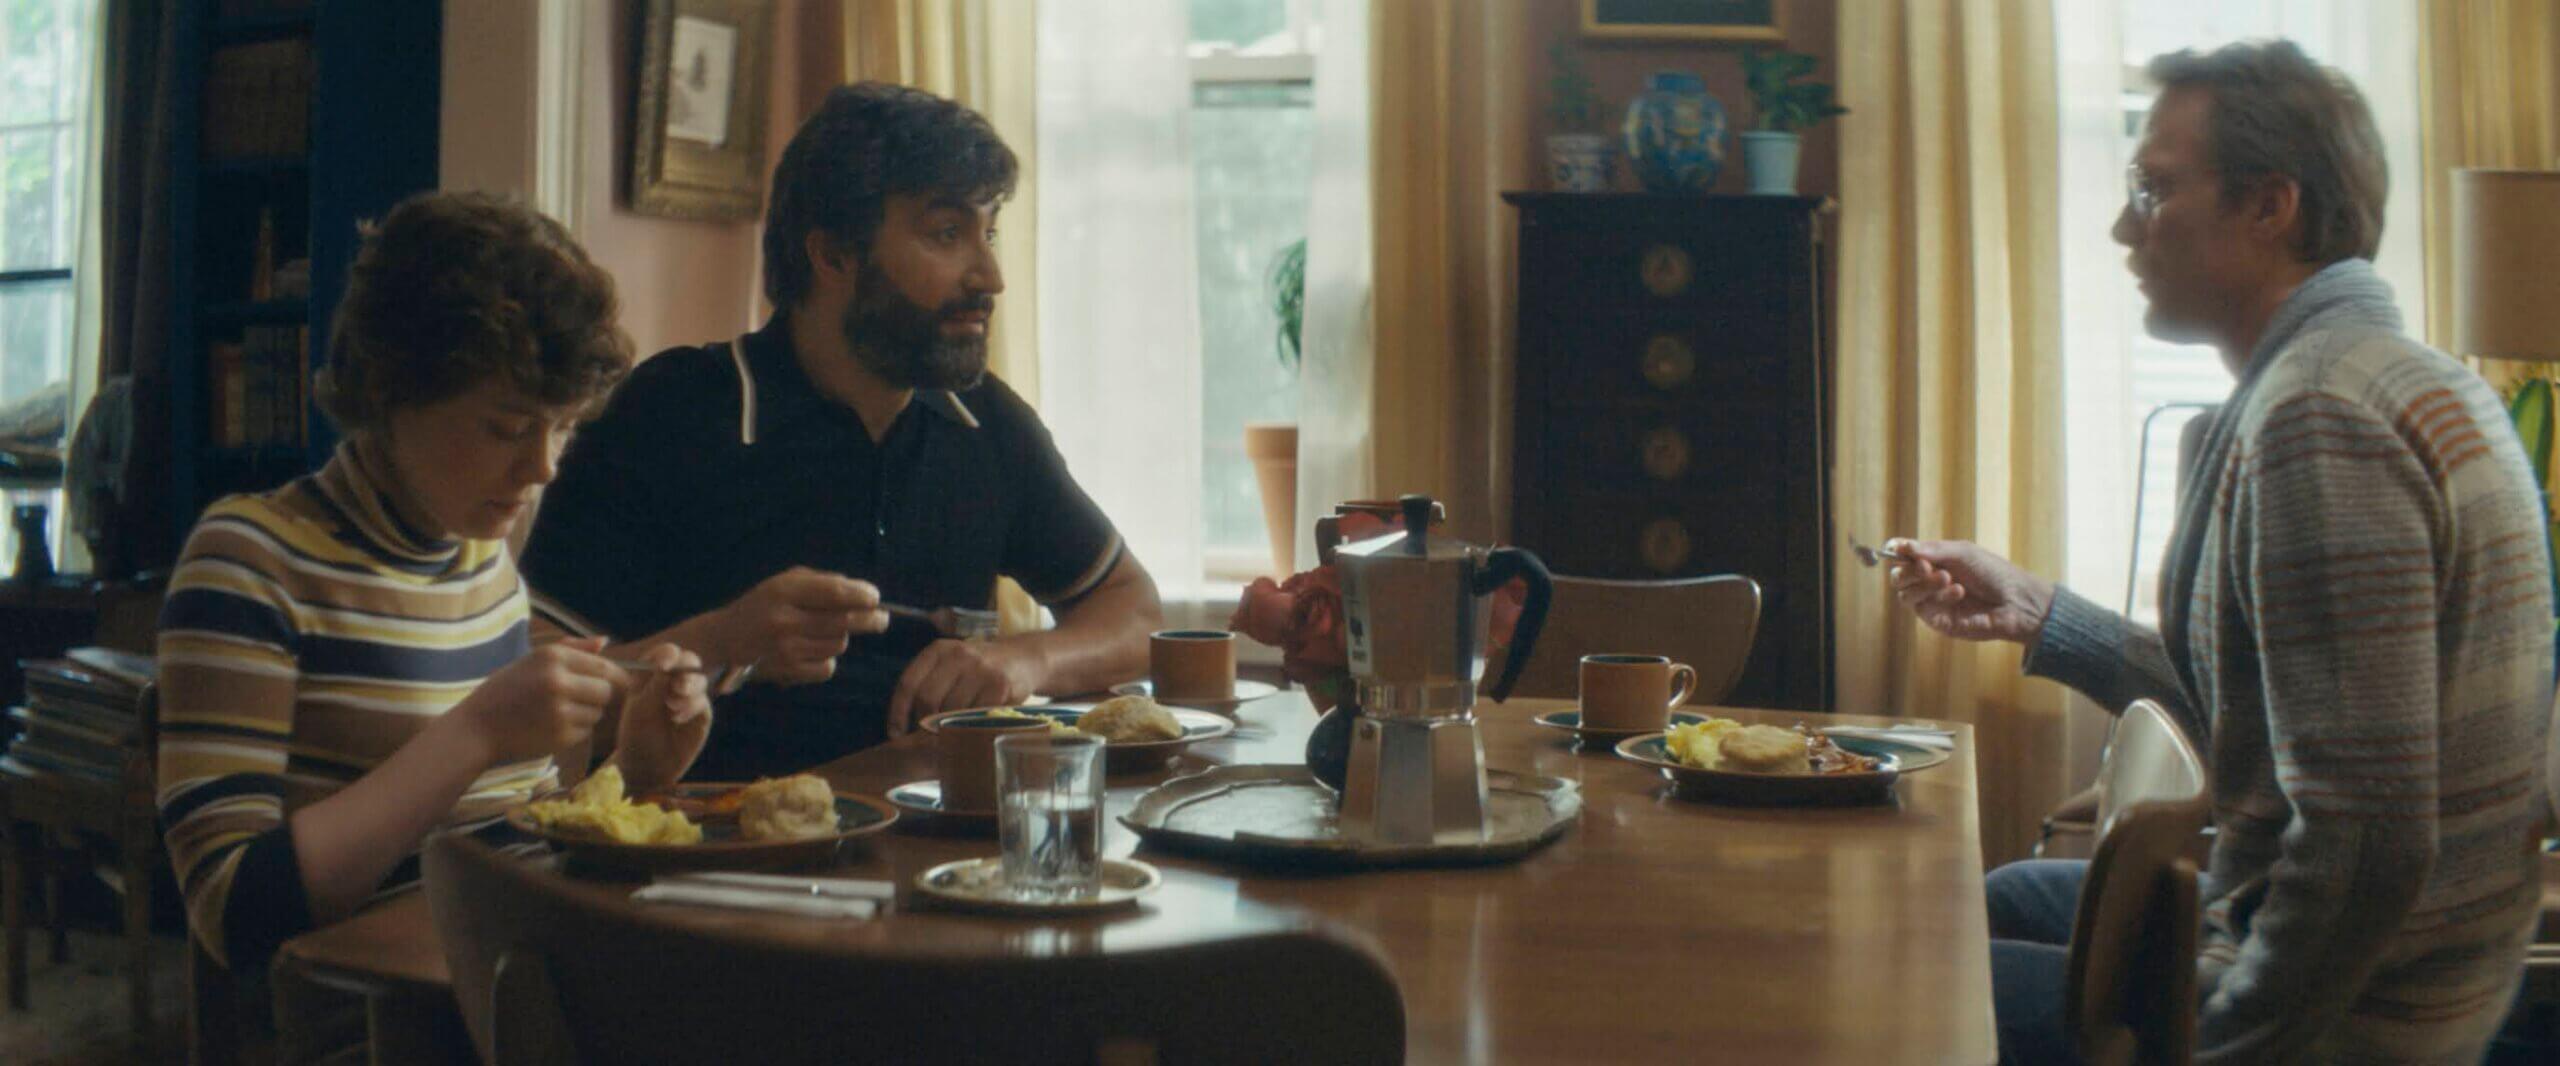 uncle-frank-amazon-movie-2020